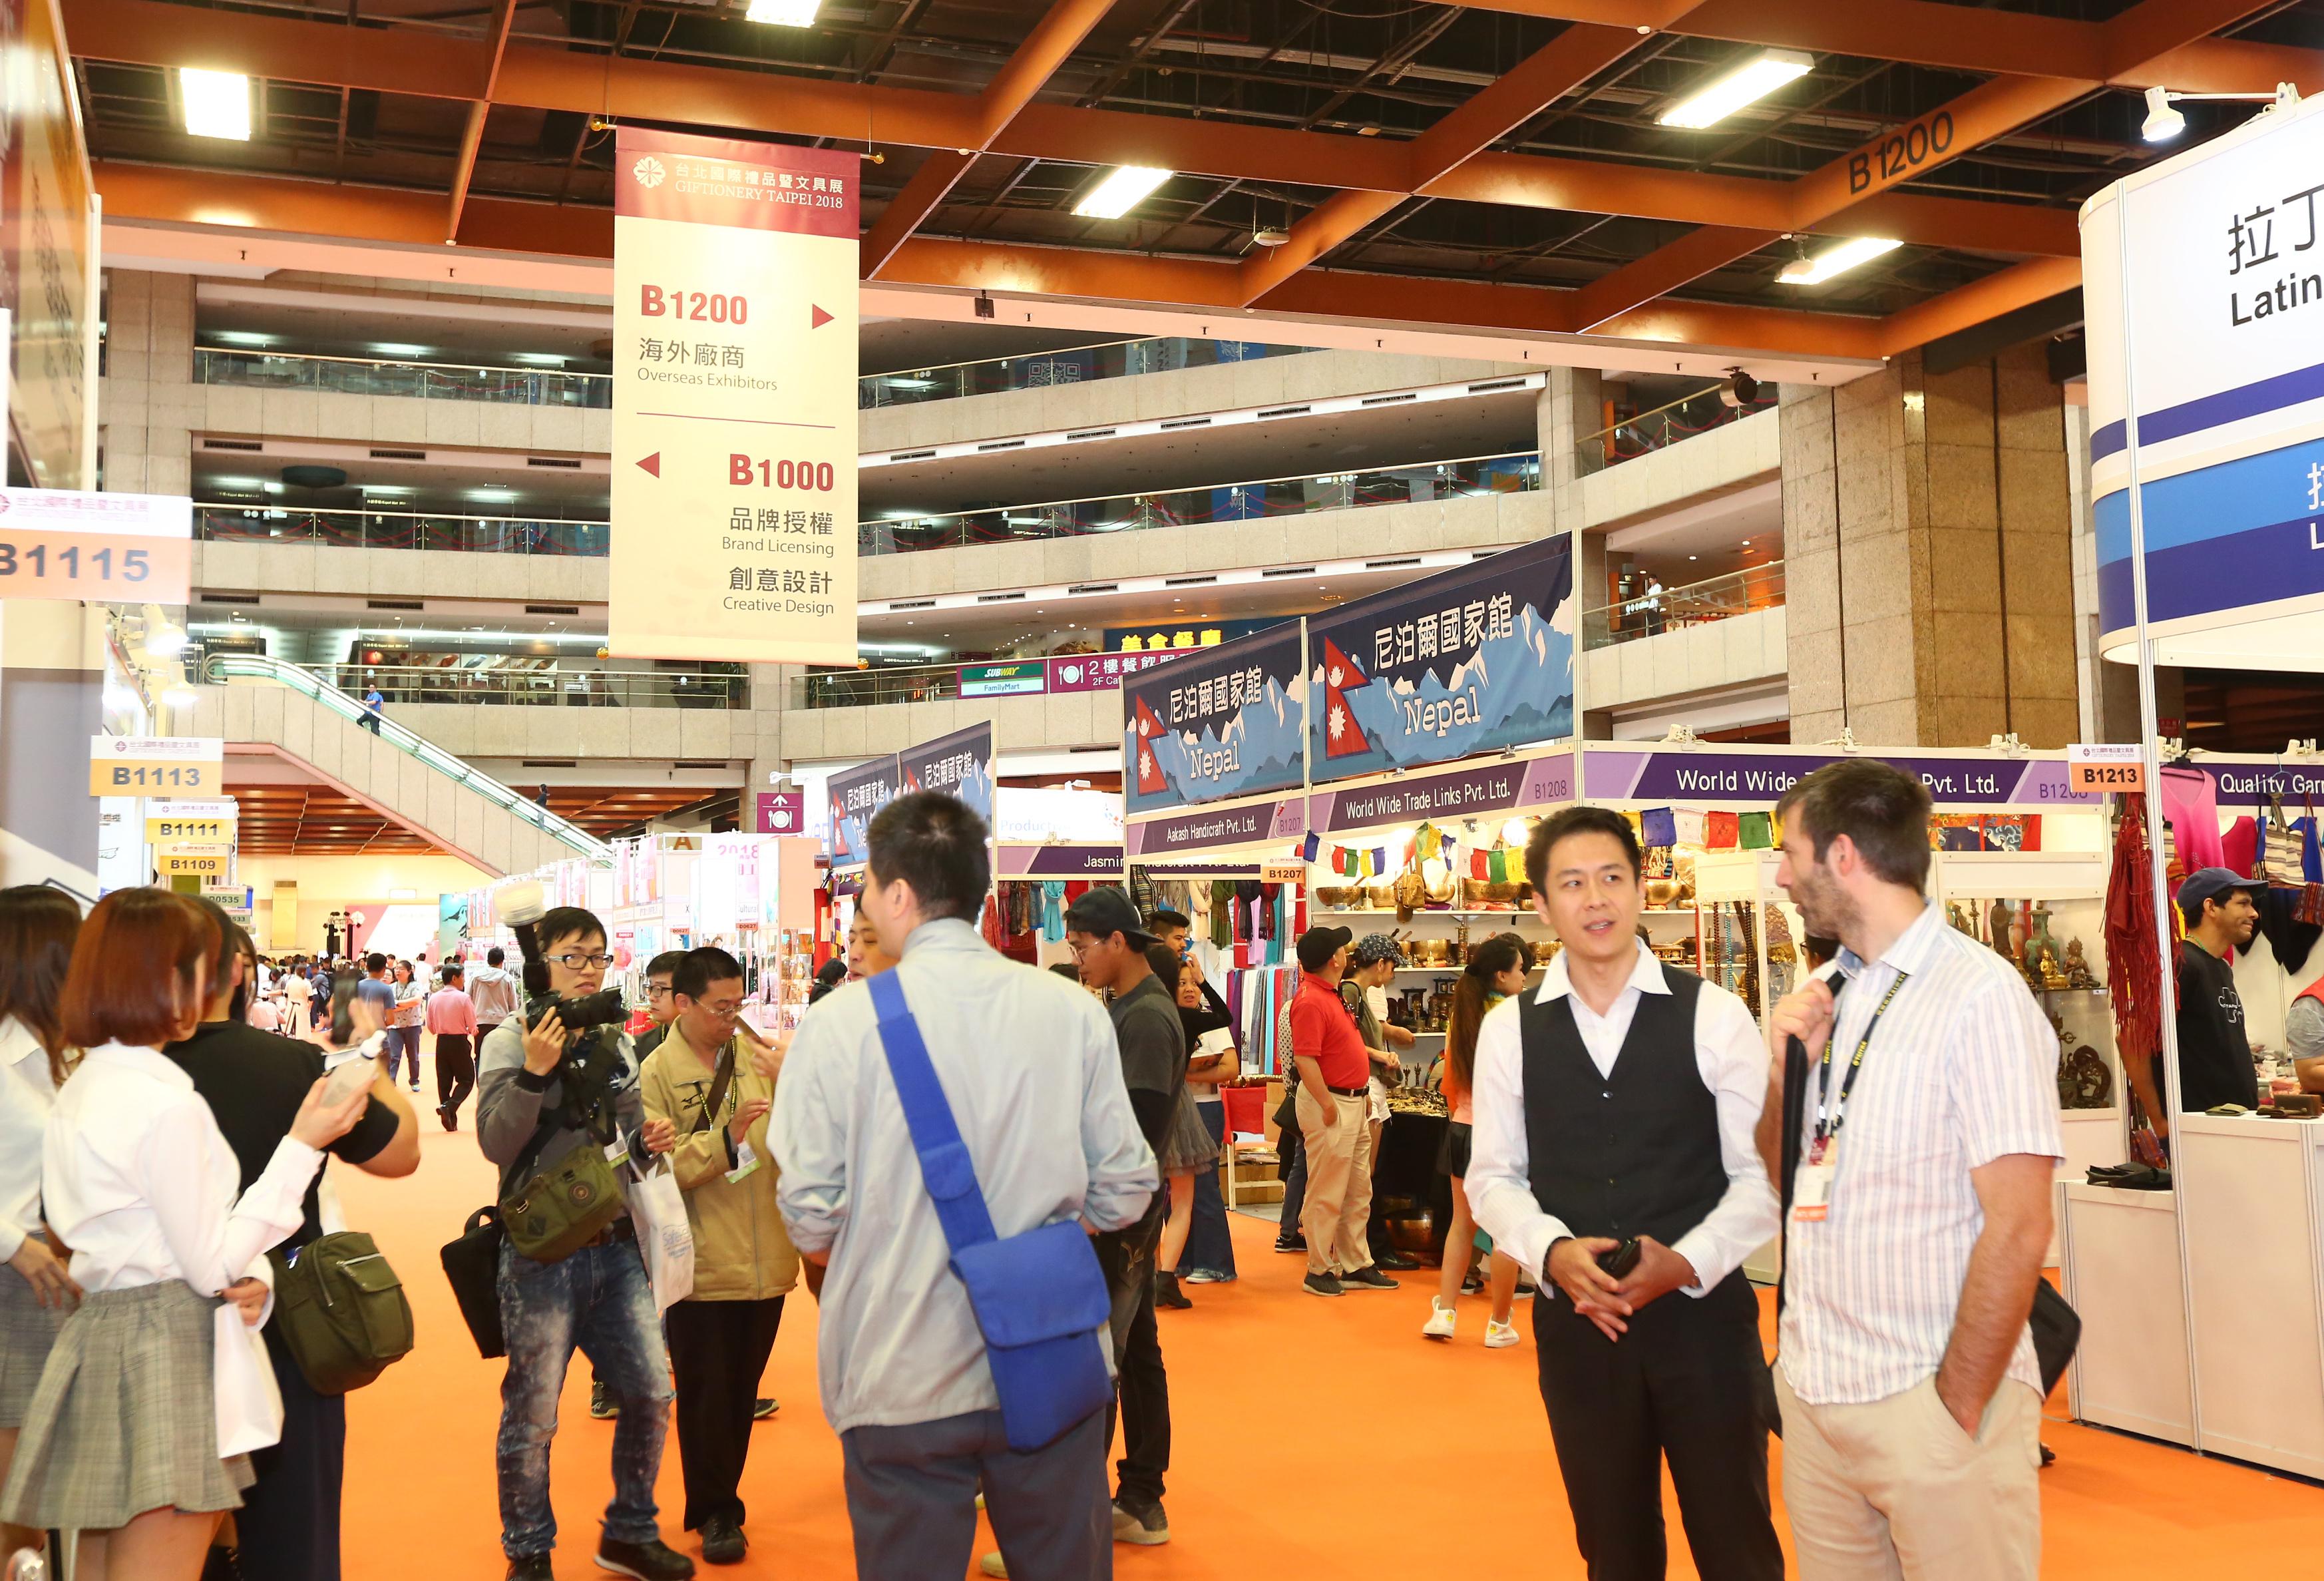 https://storage.googleapis.com/www.taiwantradeshow.com.tw/activity-photo/202011/T-93745384-name.jpg